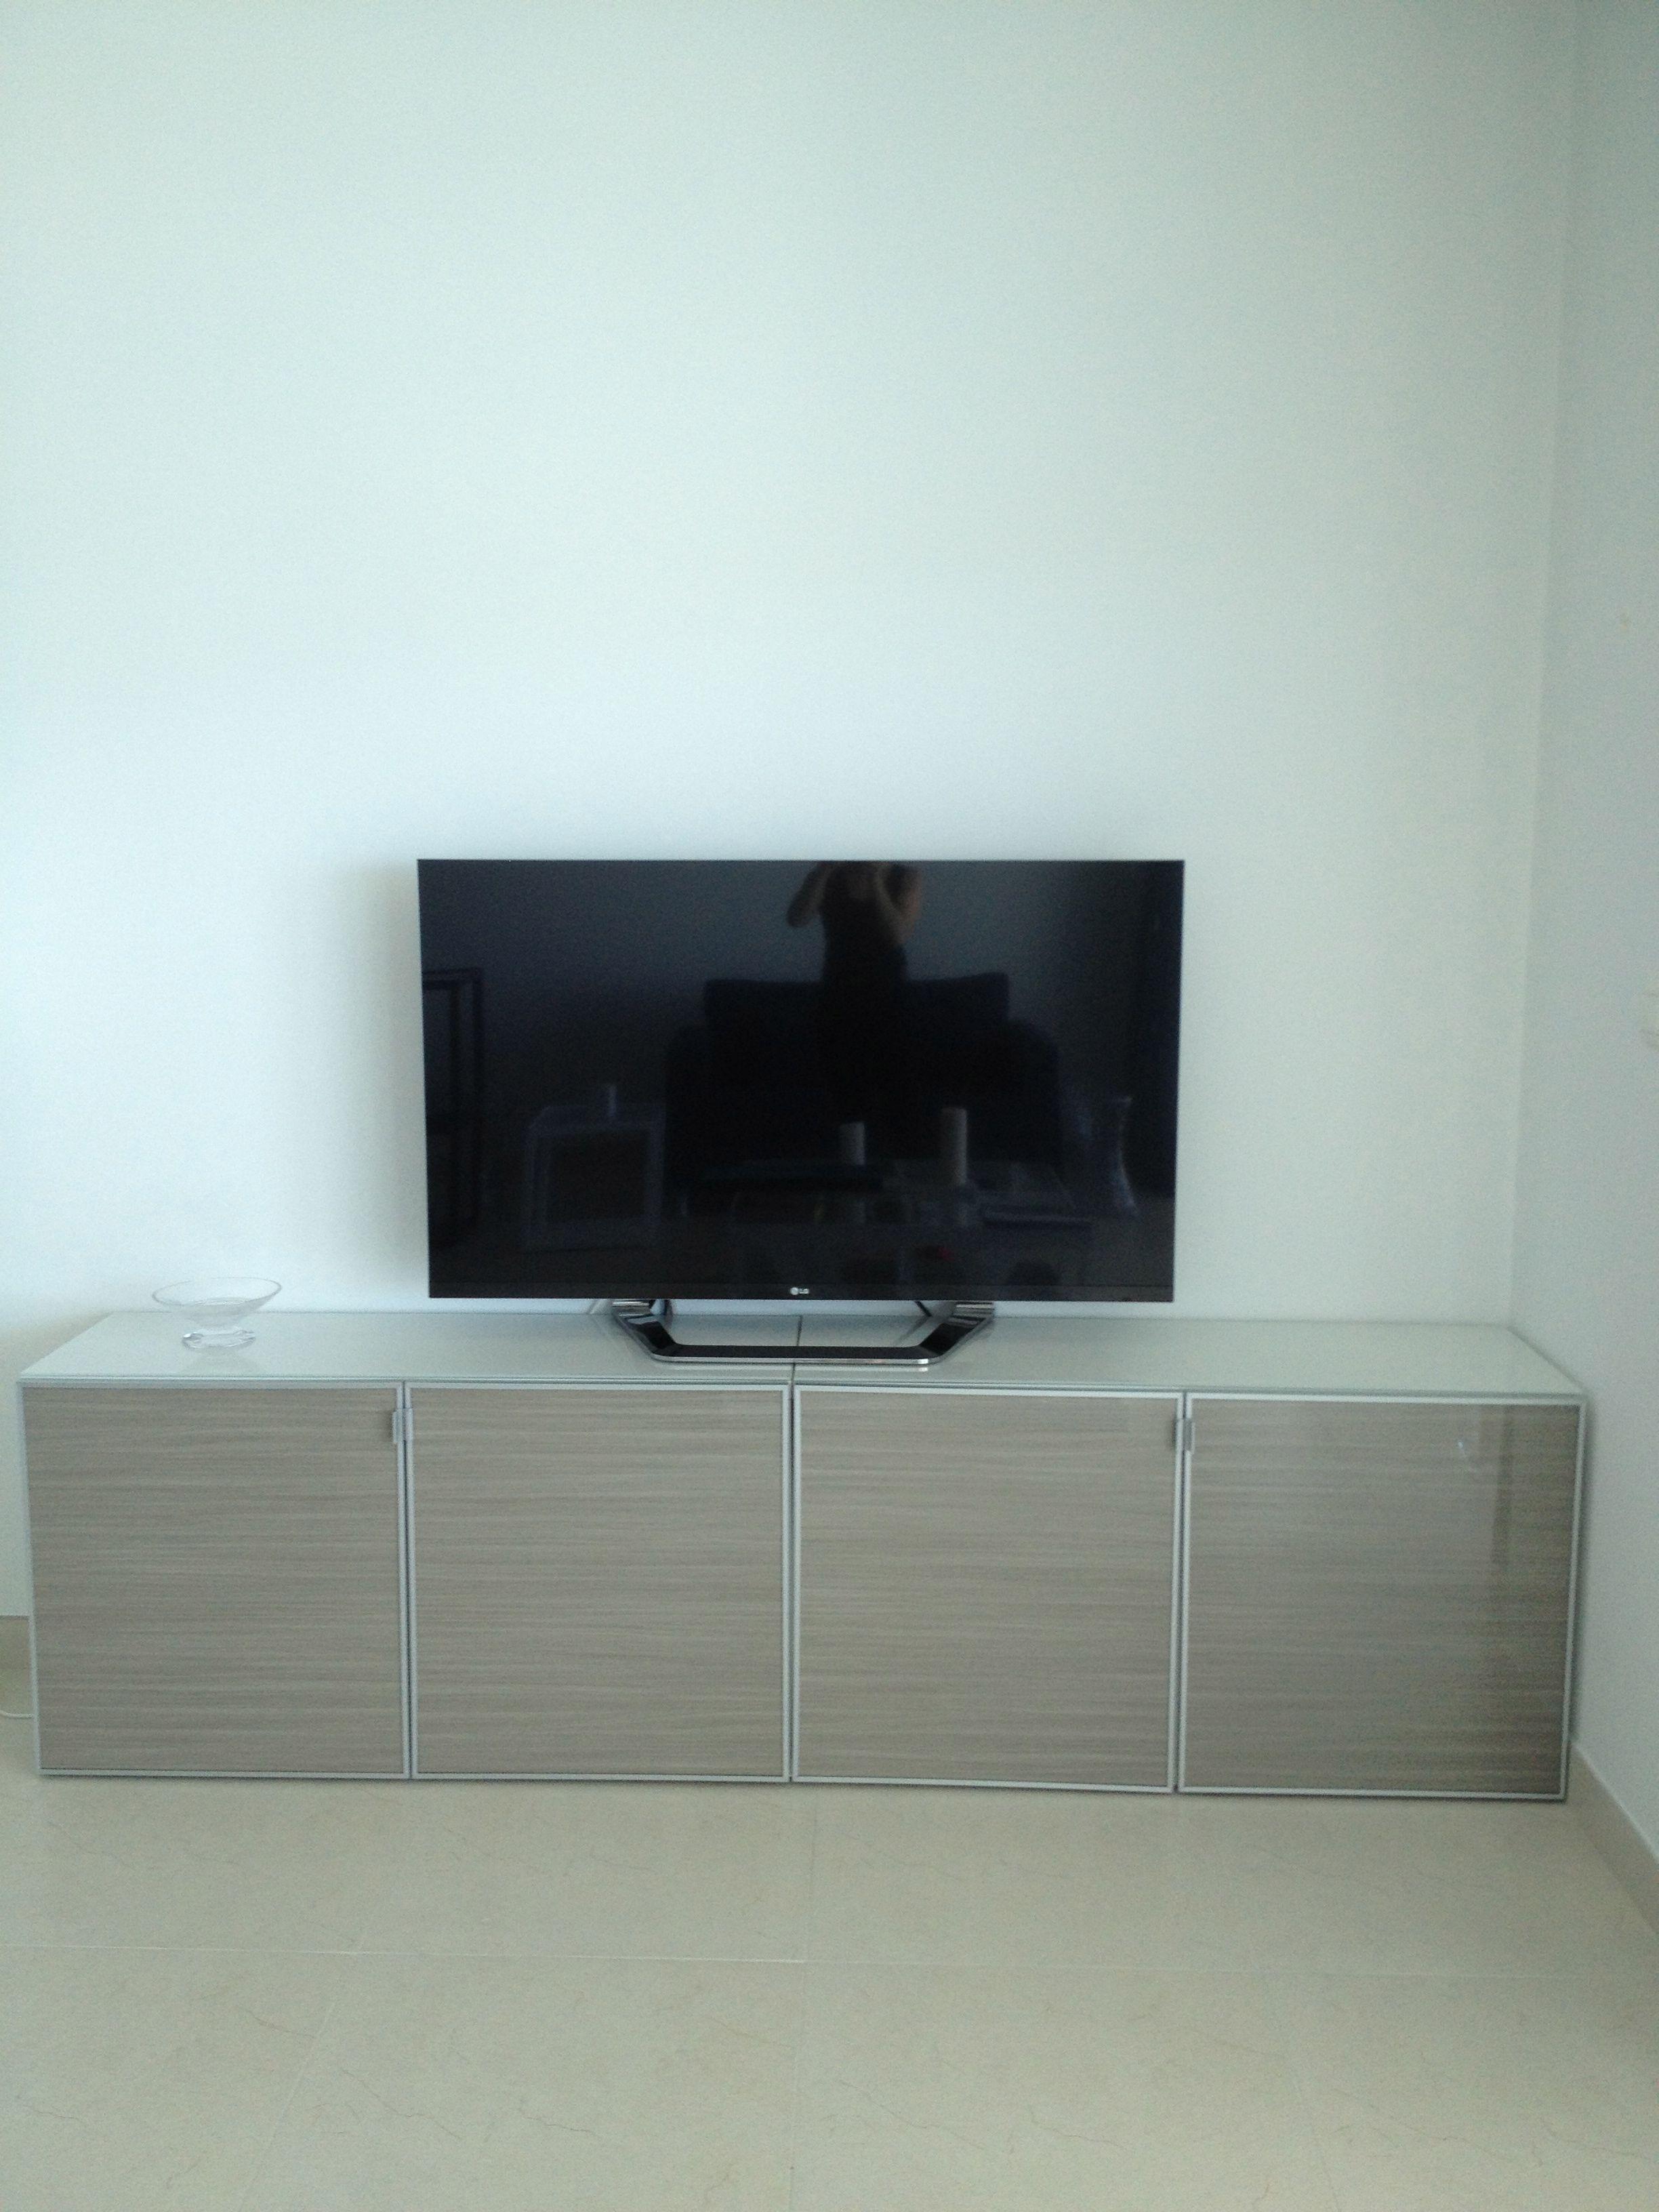 #IKEA #Besta Tombo #Chest With PANYL #Driftwood